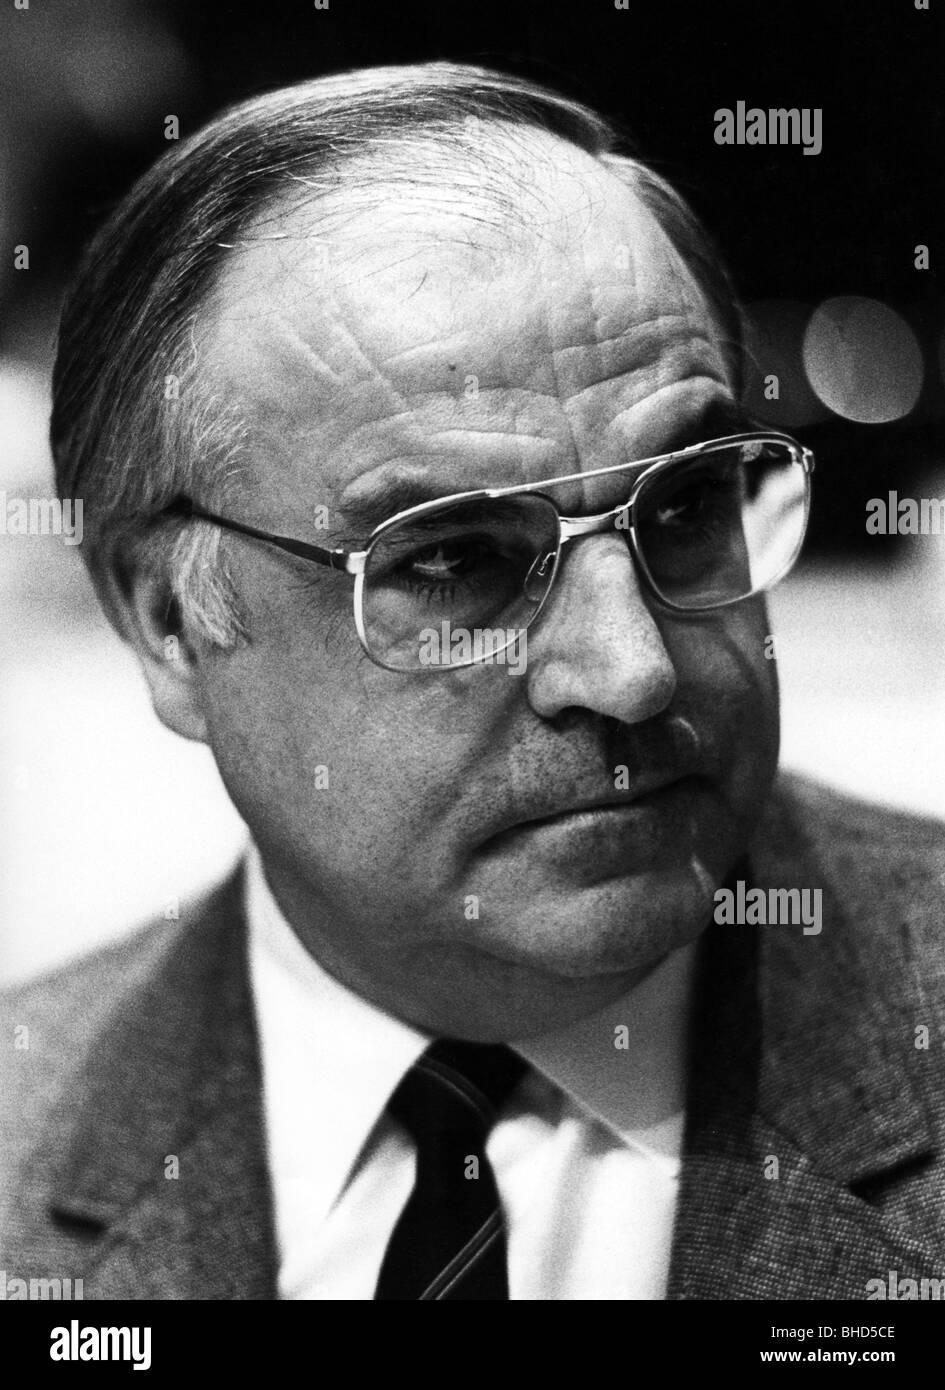 Kohl, Helmut, * 3.4.1930, German politician (CDU), Federal Chancellor 4.10.1982 - 26.10.1998, portrait, at meeting - Stock Image